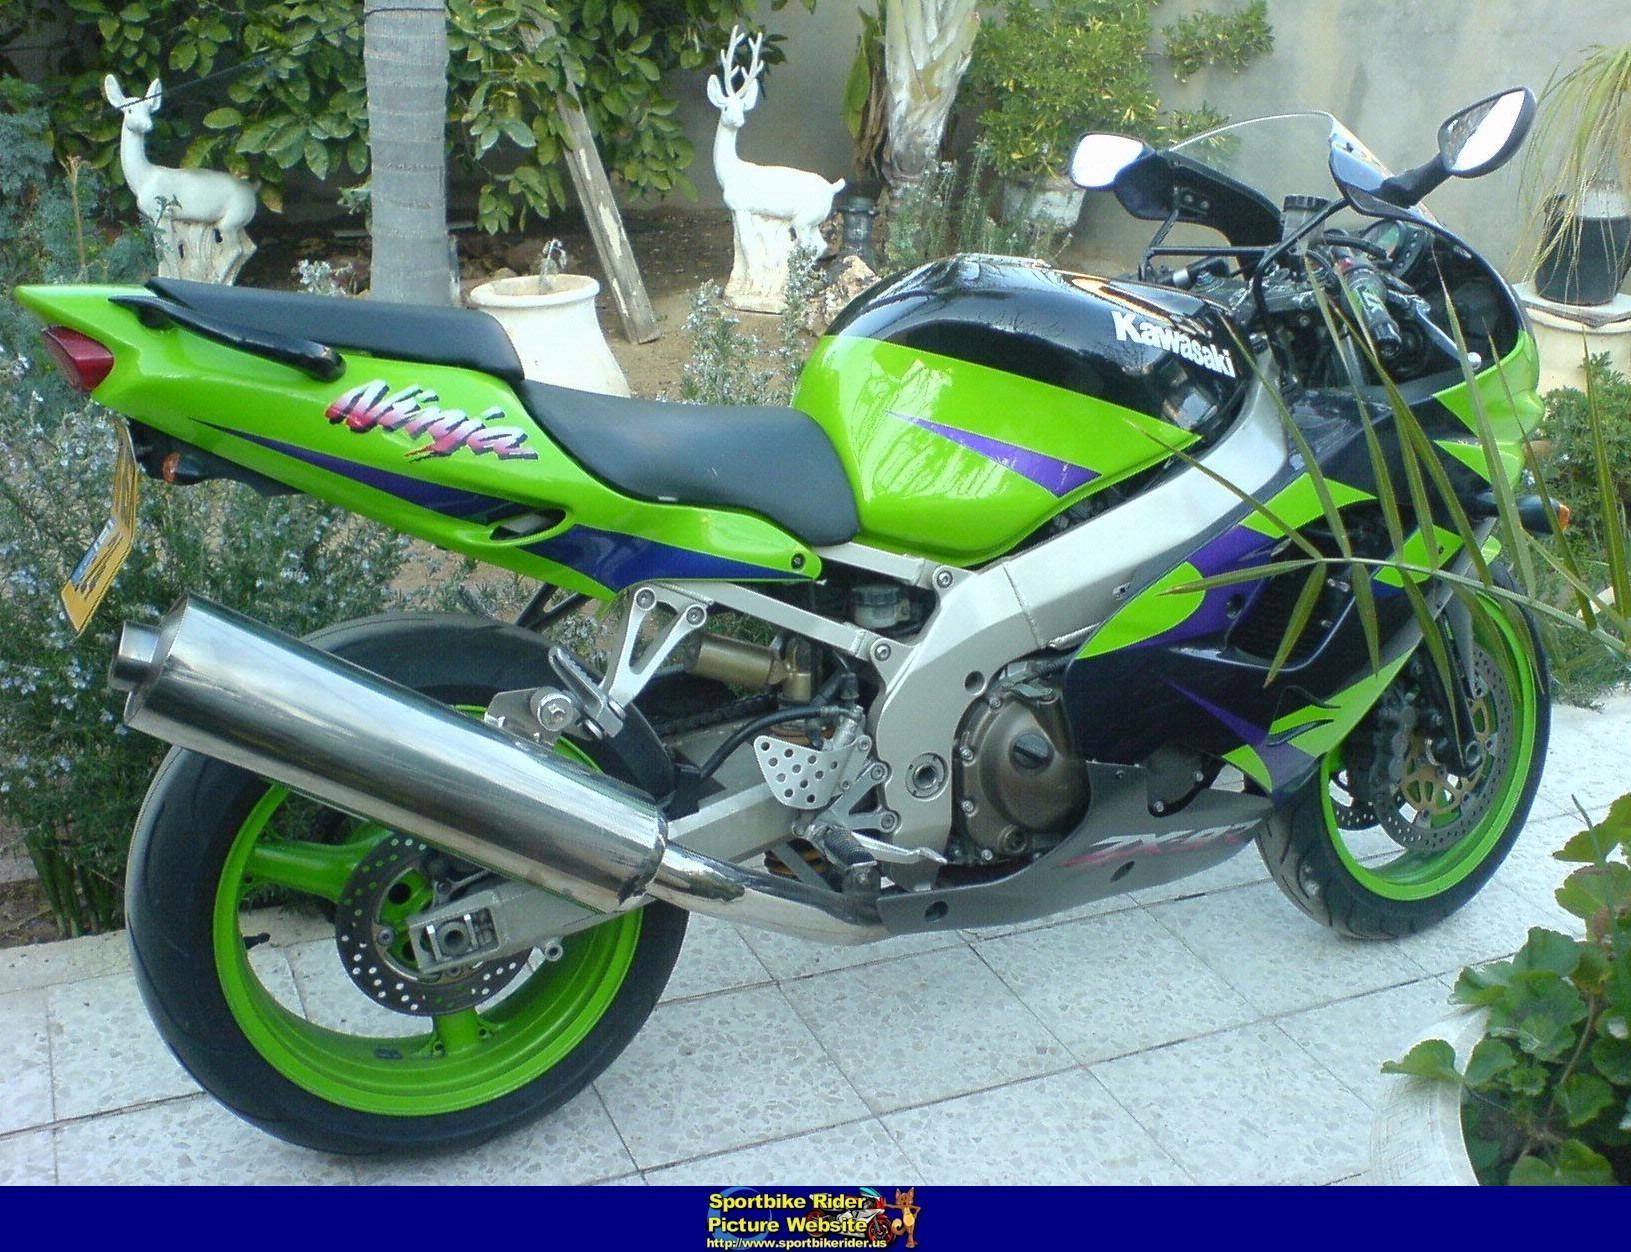 Kawasaki ZX-12R 1 200 cm³ 2003 - Pori - Moottoripyörä